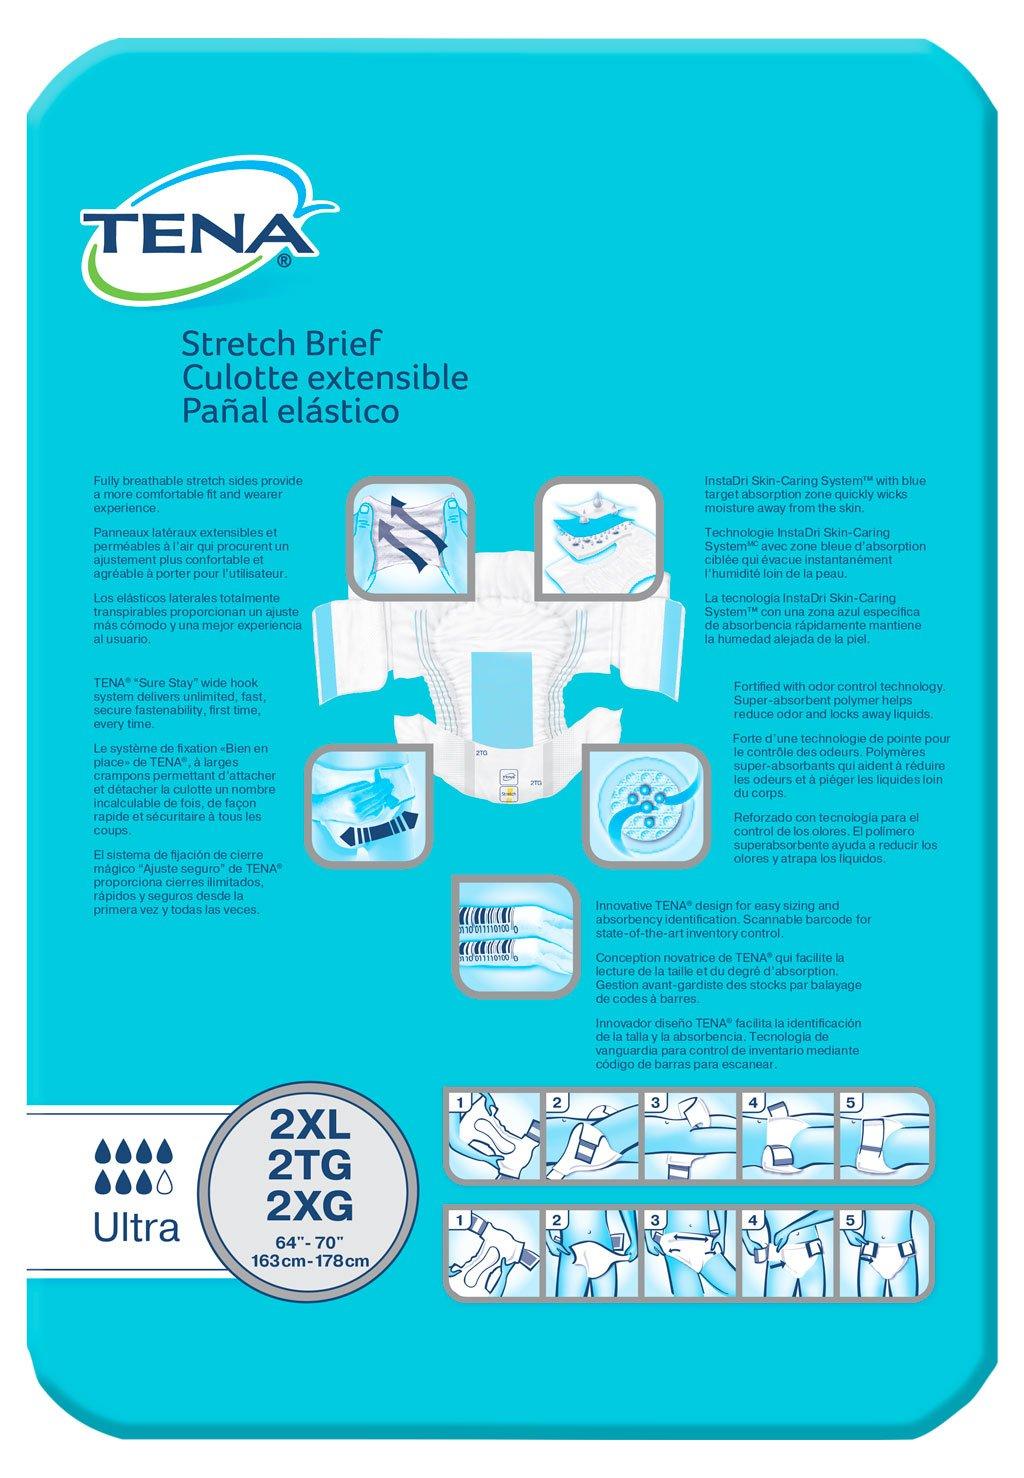 Amazon.com: TENA Bariatric Ultra Brief, XX-Large, 32 Count: Health & Personal Care